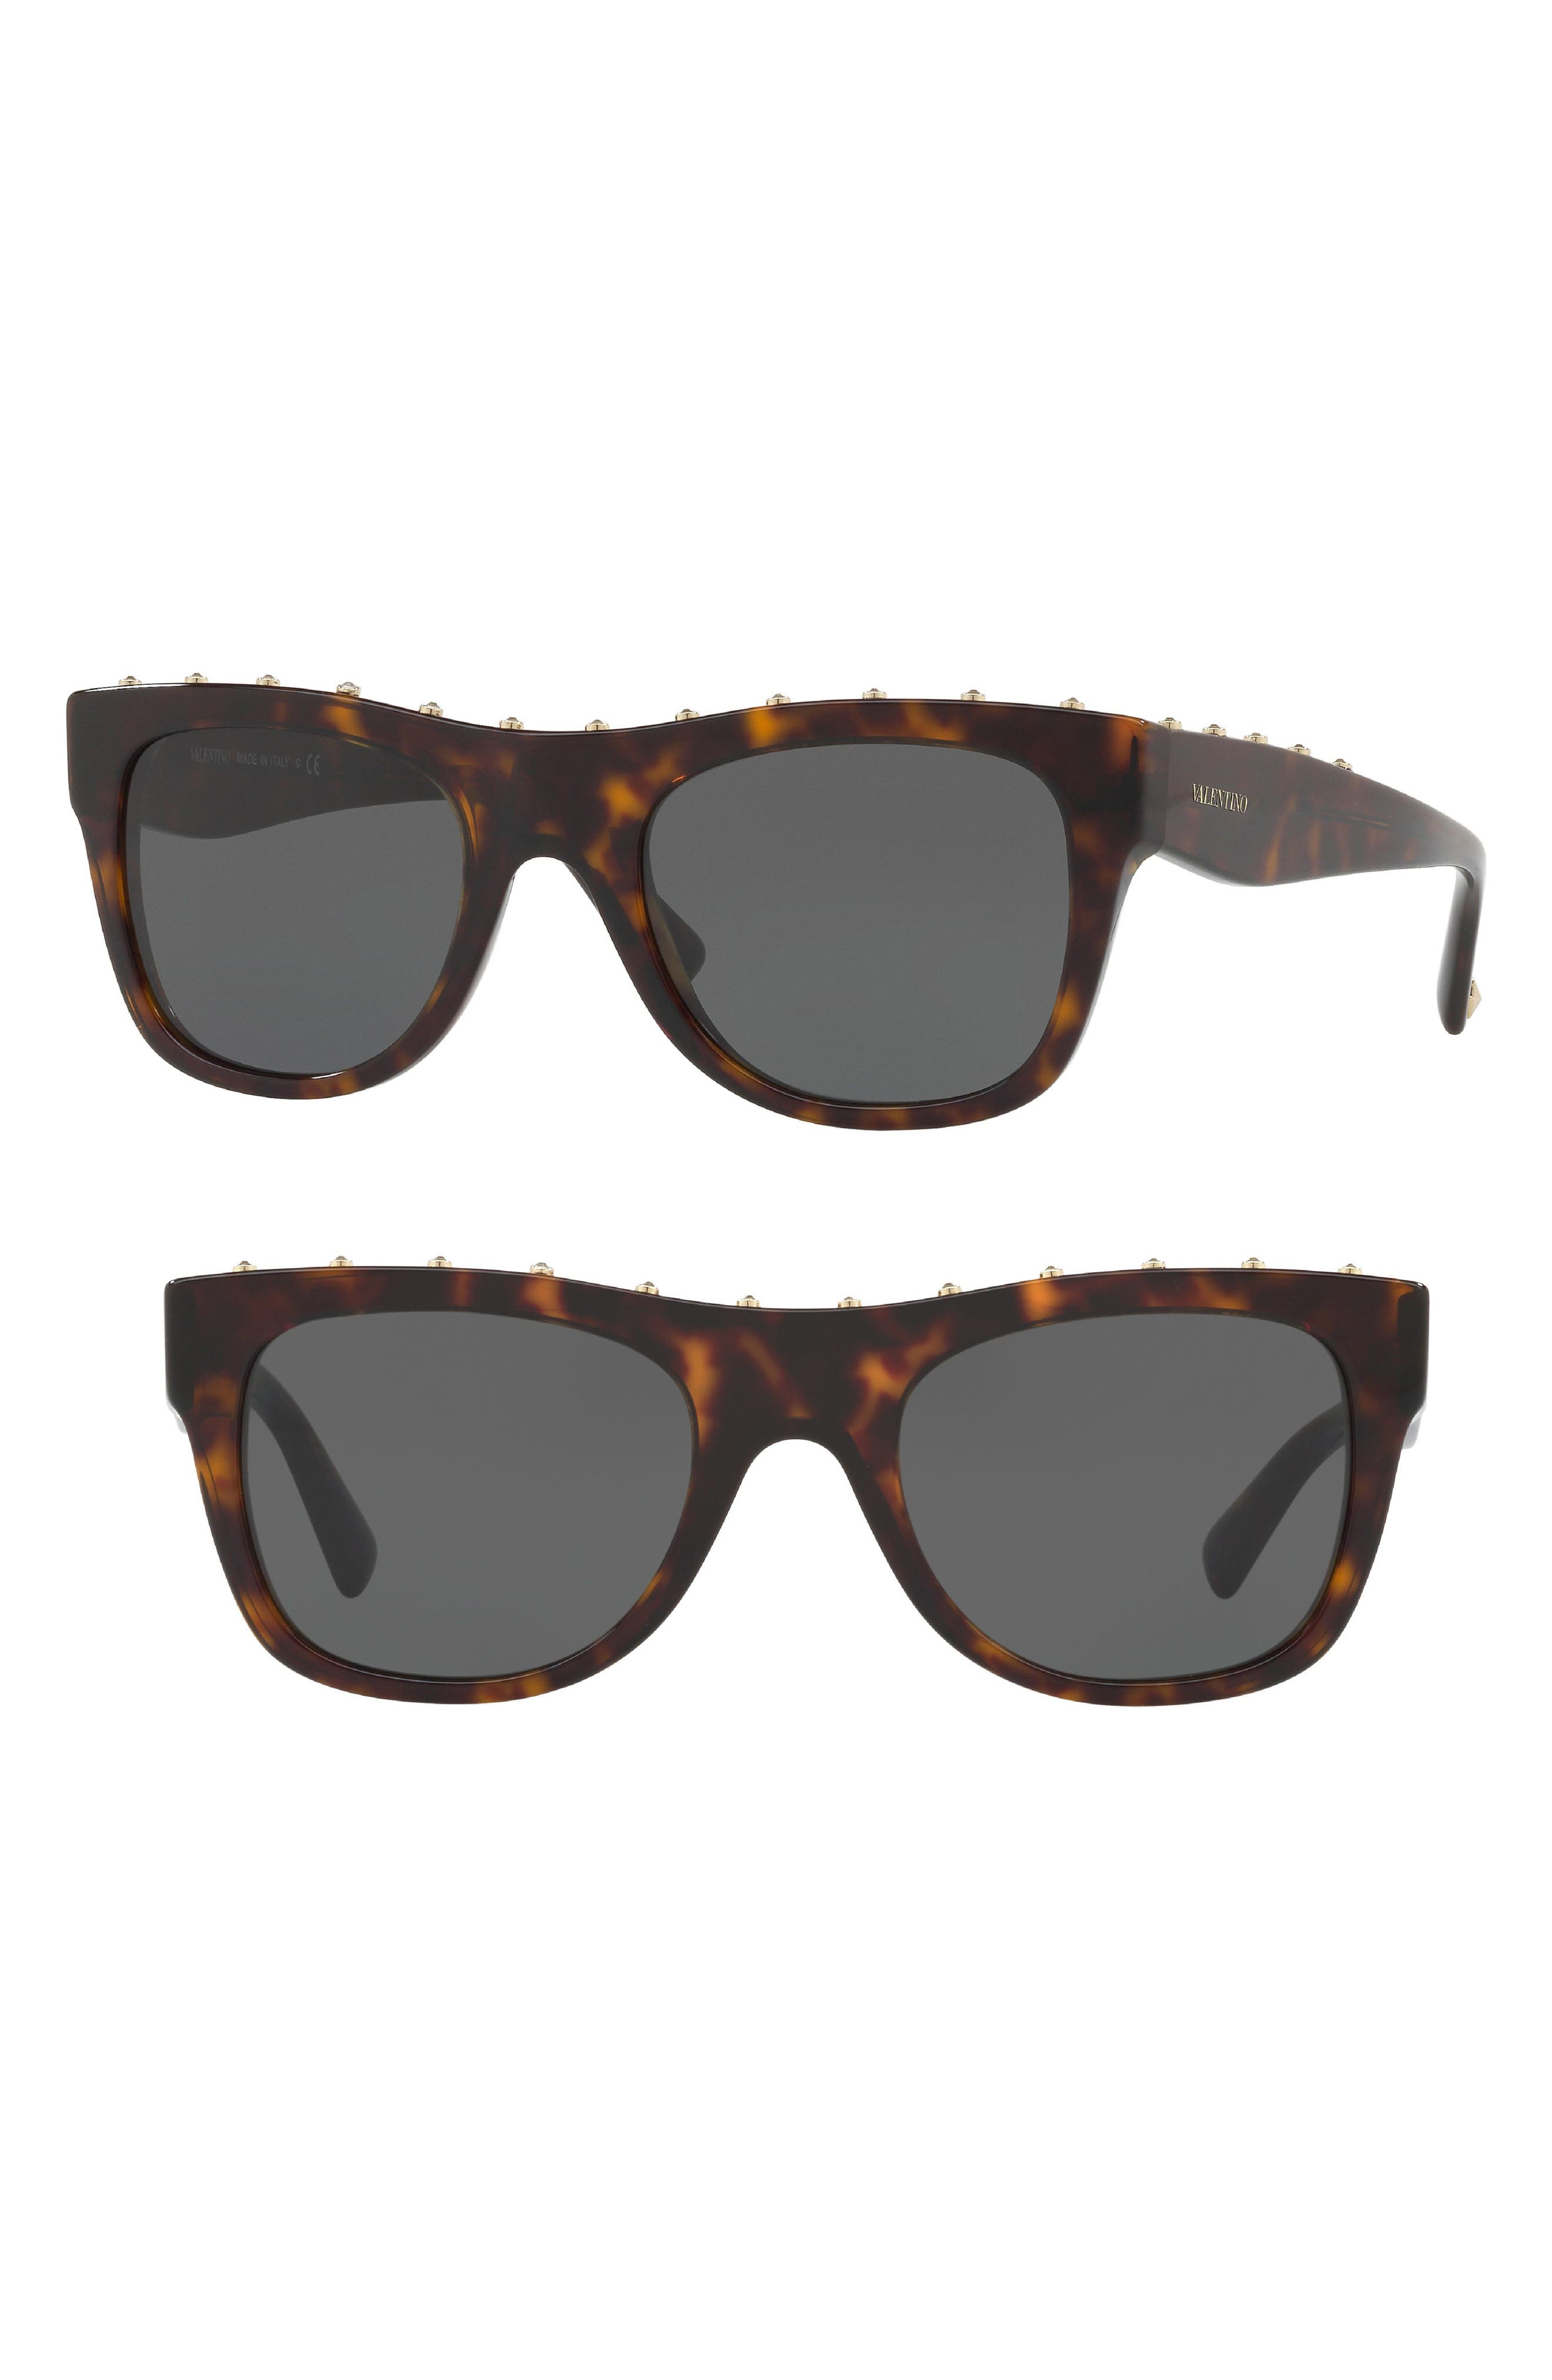 Valentino 51mm Studded Sunglasses